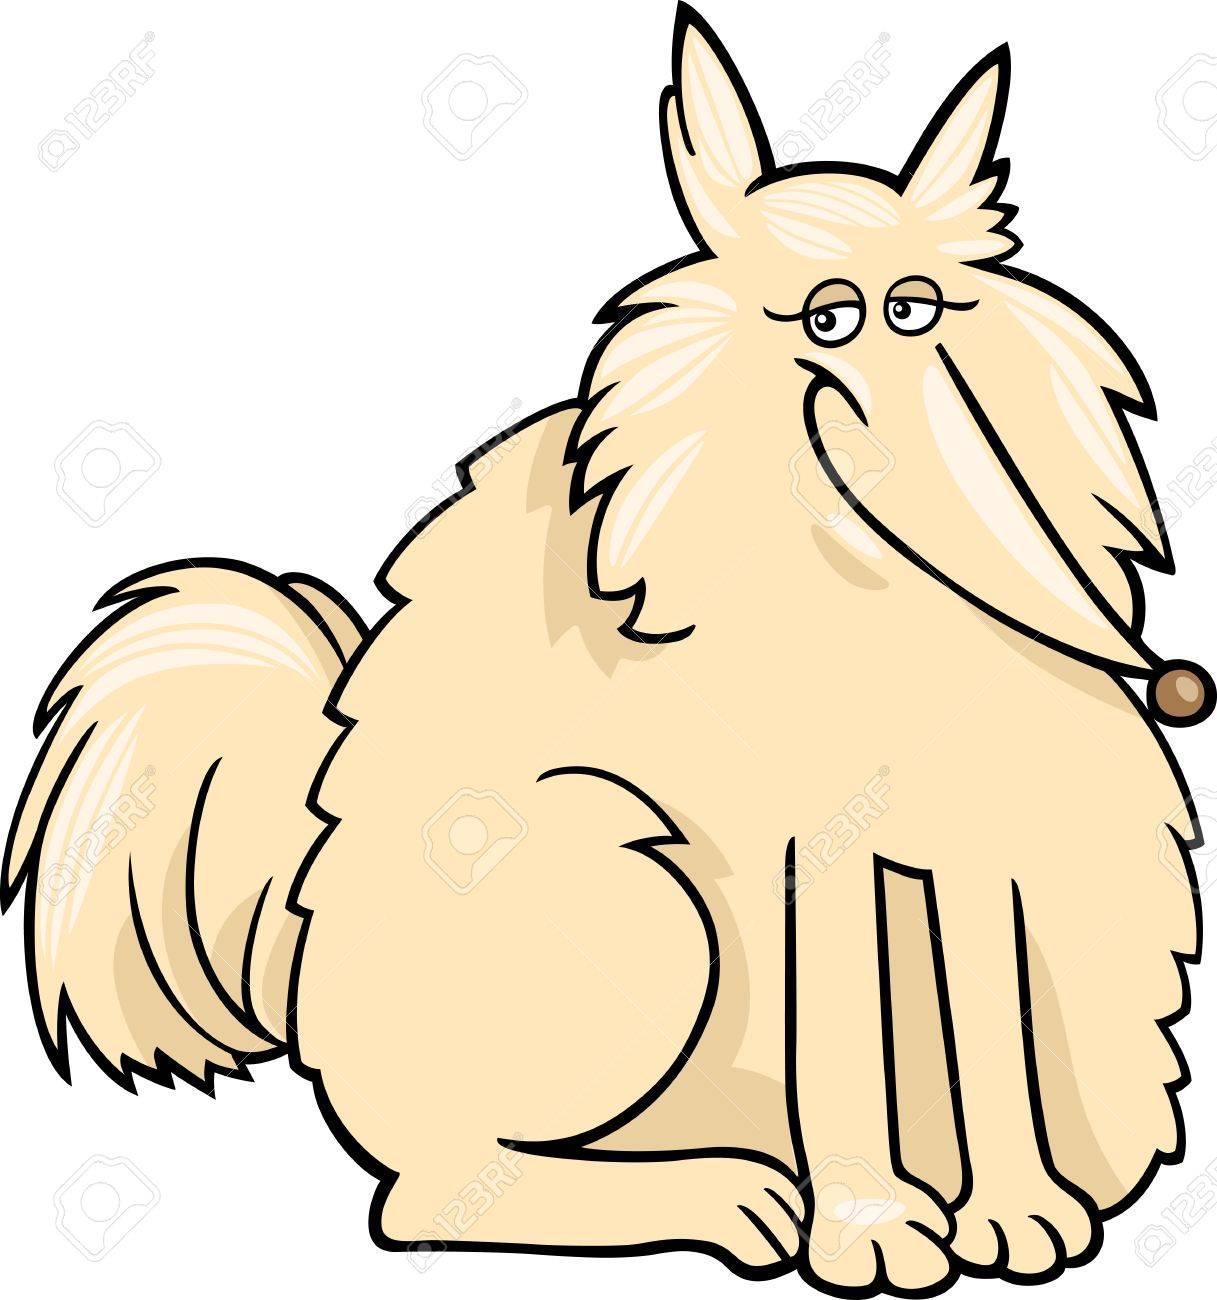 Cartoon Illustration of Funny Purebred Eskimo Dog or Spitz Stock Vector - 16452314